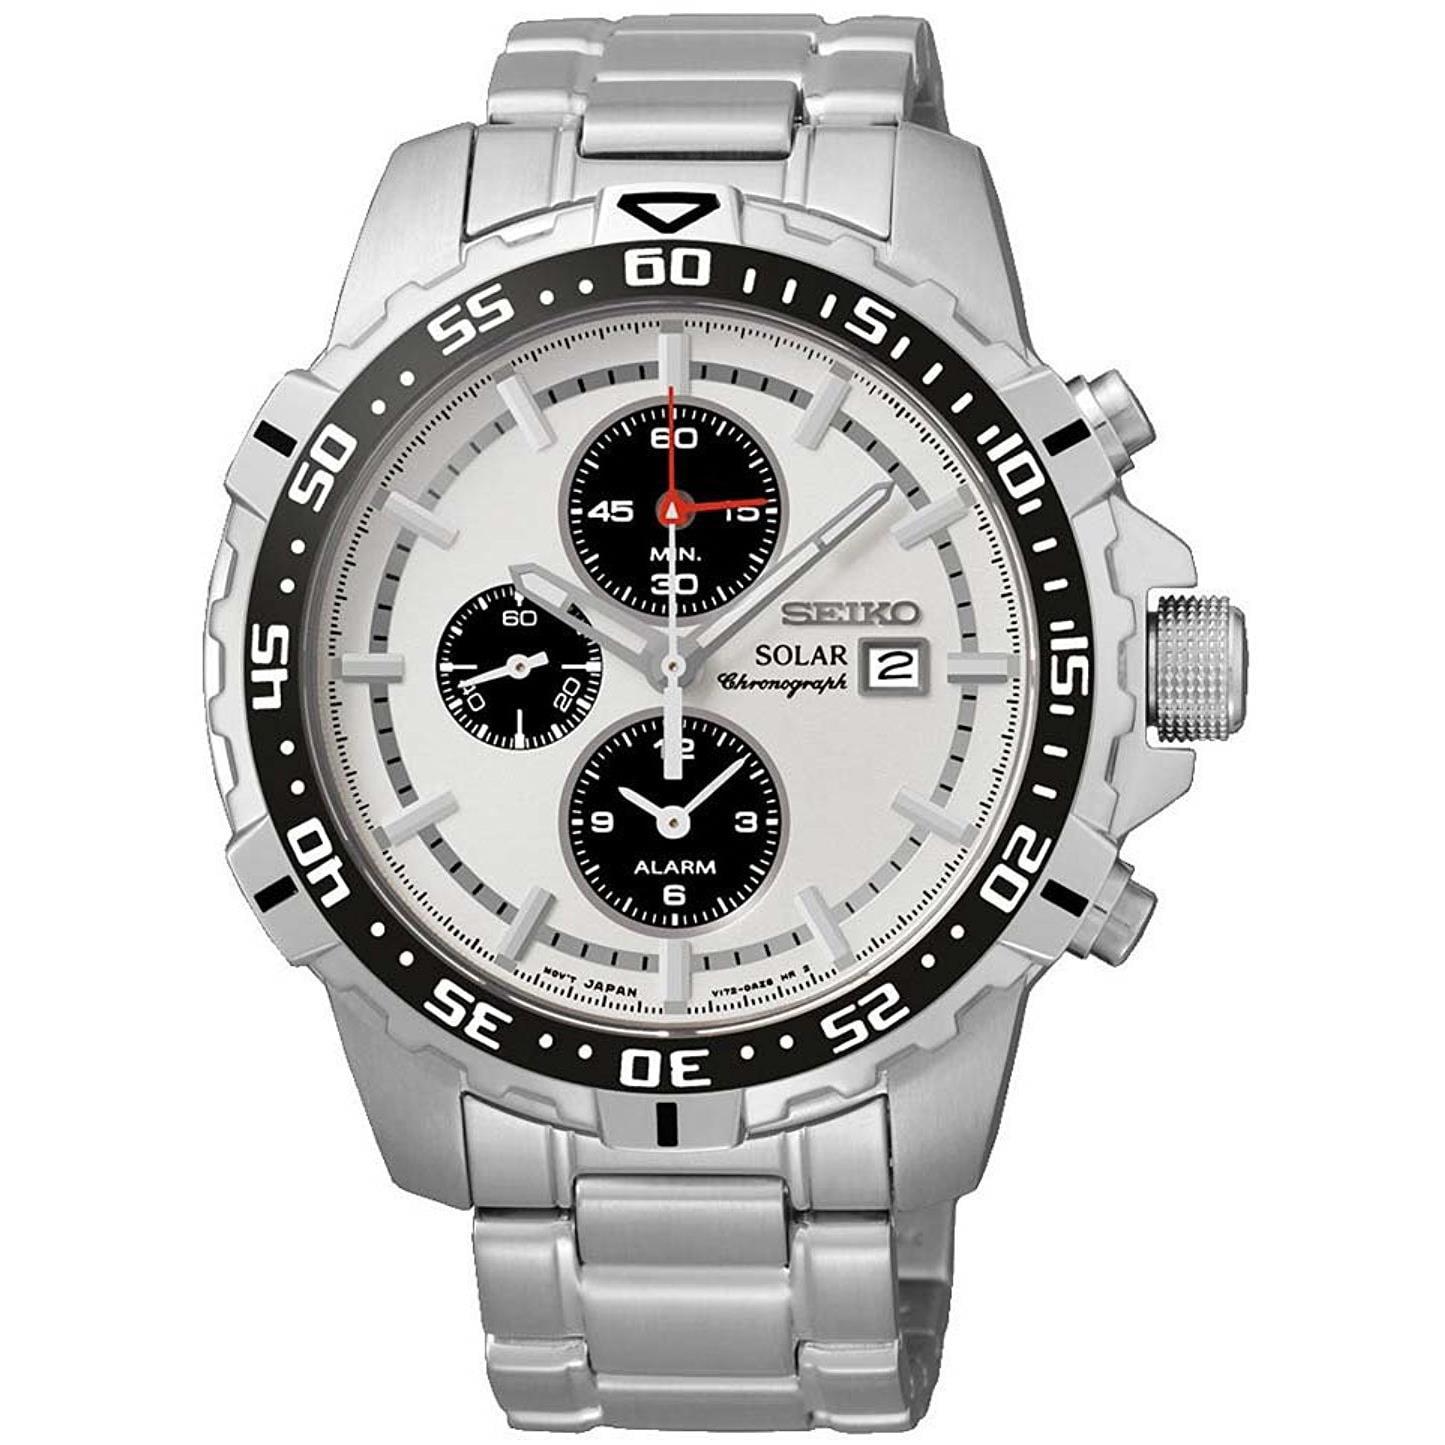 Seiko Men's 45mm Grey Steel Bracelet & Case Automatic White Dial Chronograph Watch SSC297P1 by Seiko